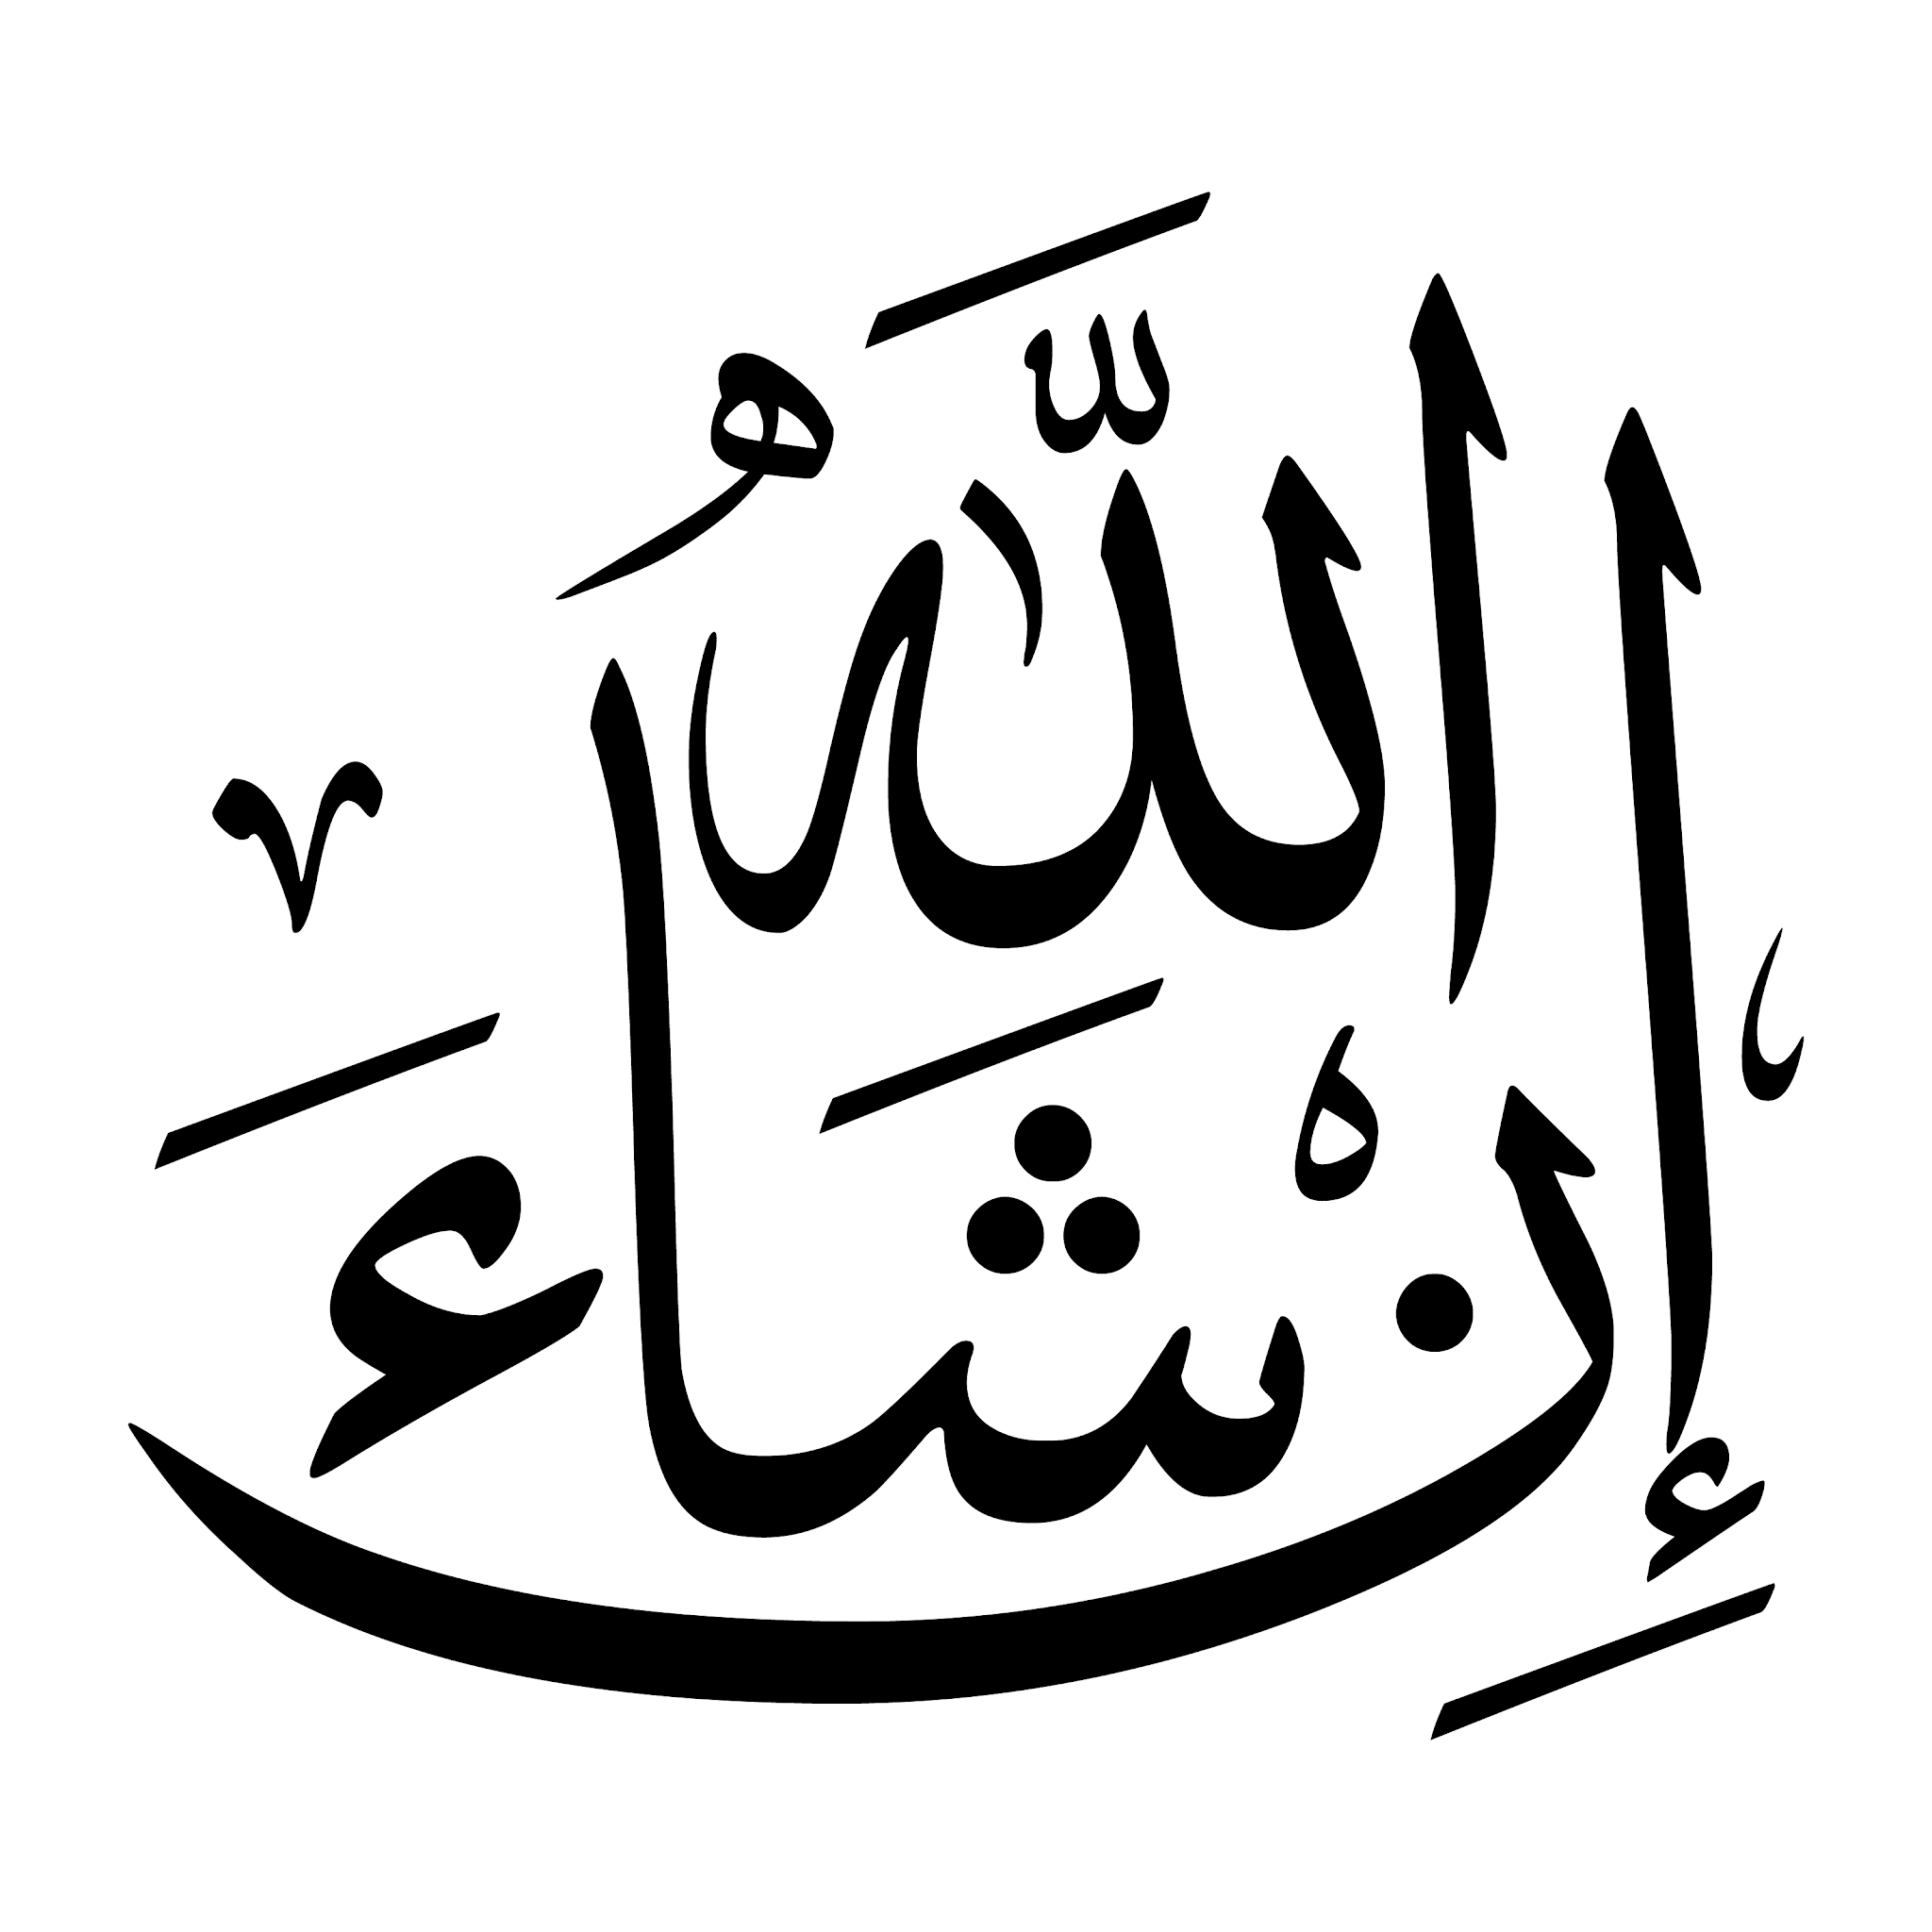 in sha allah islamic svg eps psd ai pdf png vector download free #islamic #islam #arab #arabic #vector #vectors #Quran #design #fonts #font #ramadan #hijri #year